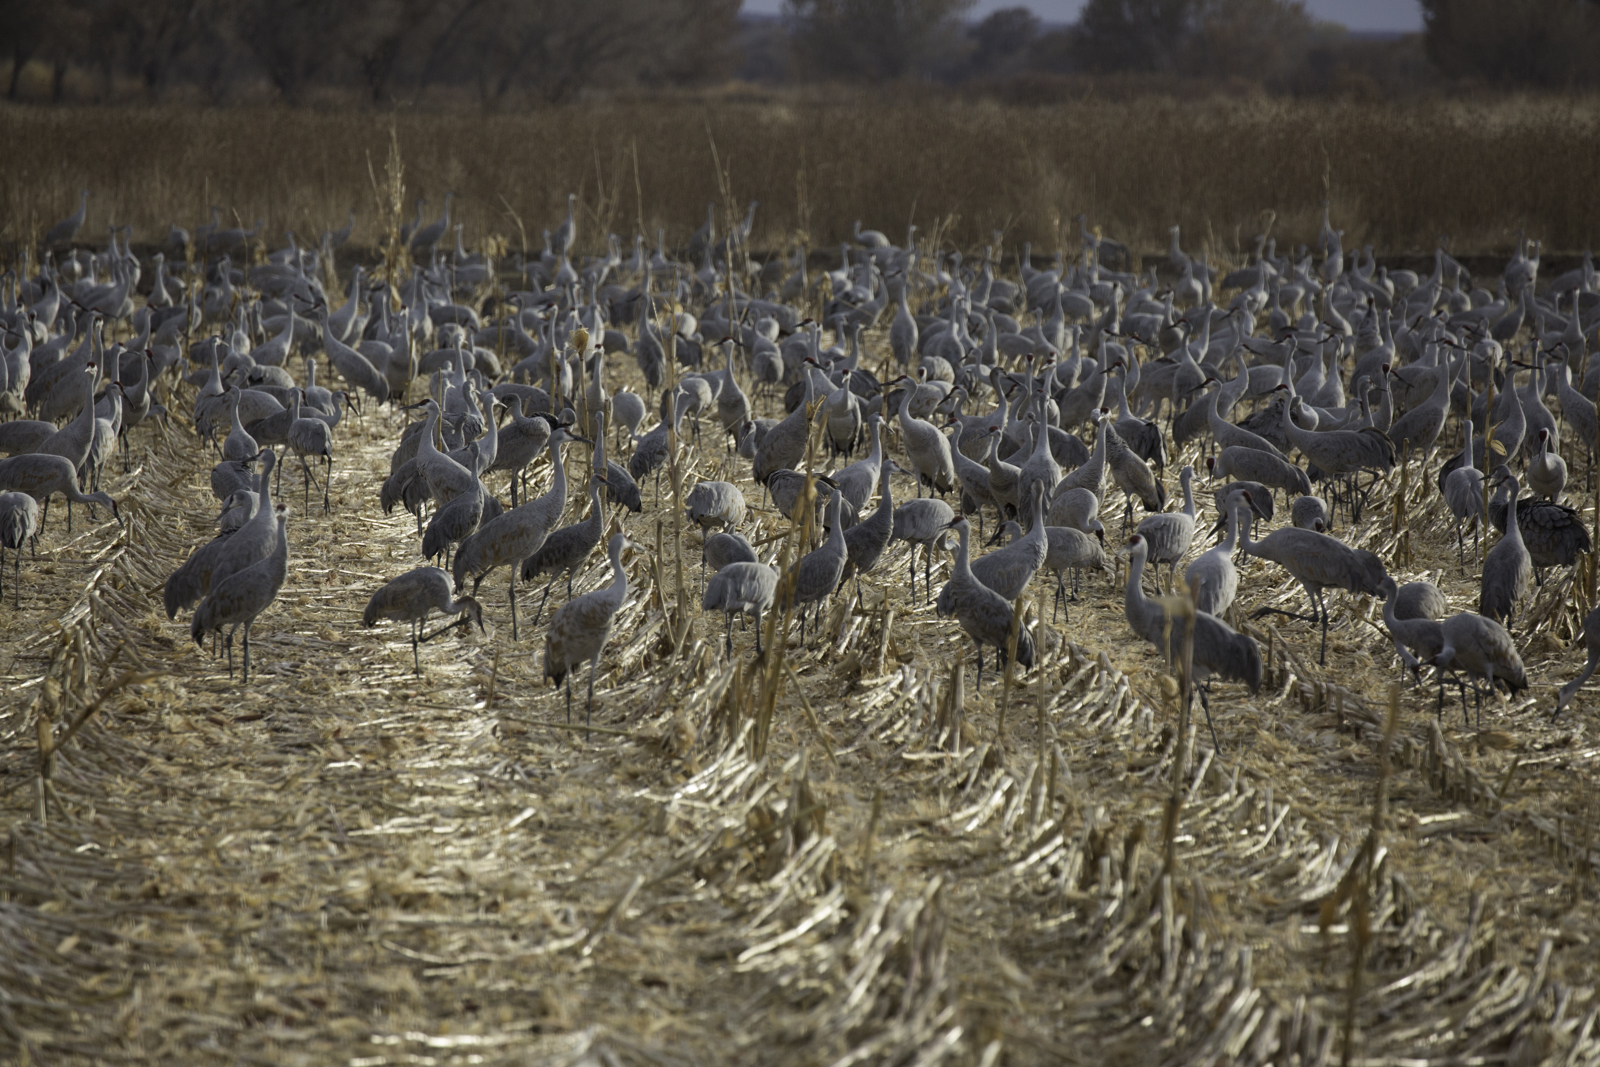 Sandhill Cranes Feeding in Corn Field